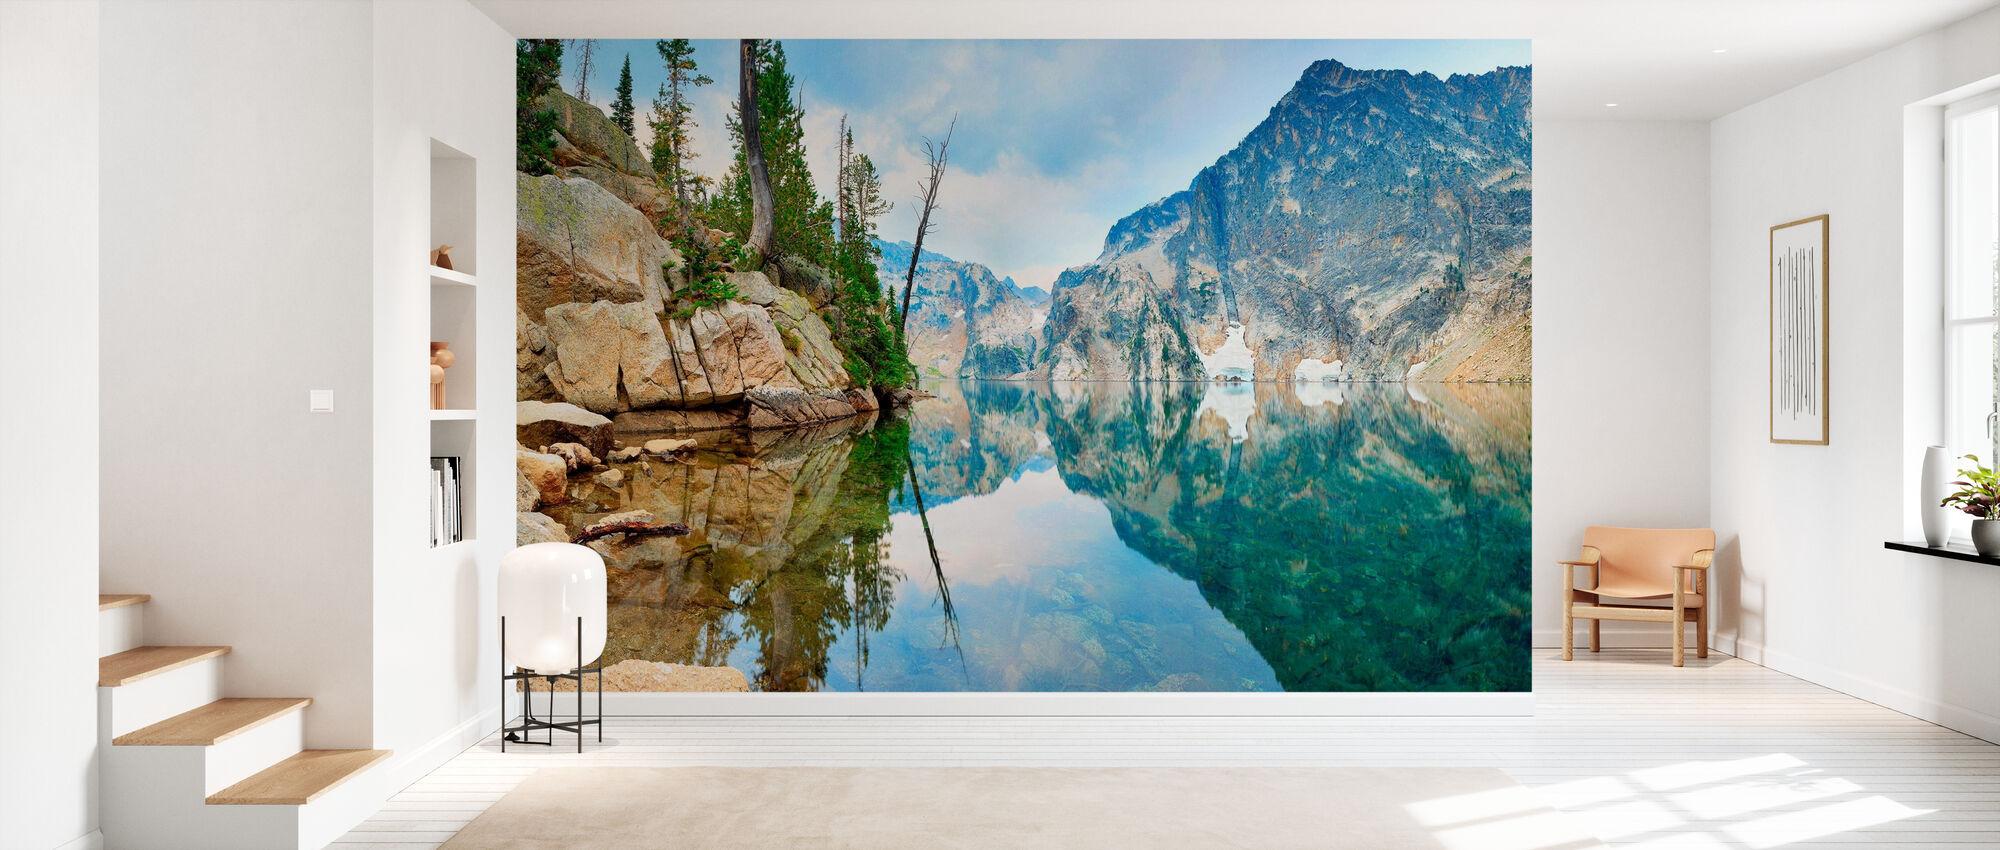 Mountain Lake with Mirror Reflection - Wallpaper - Hallway